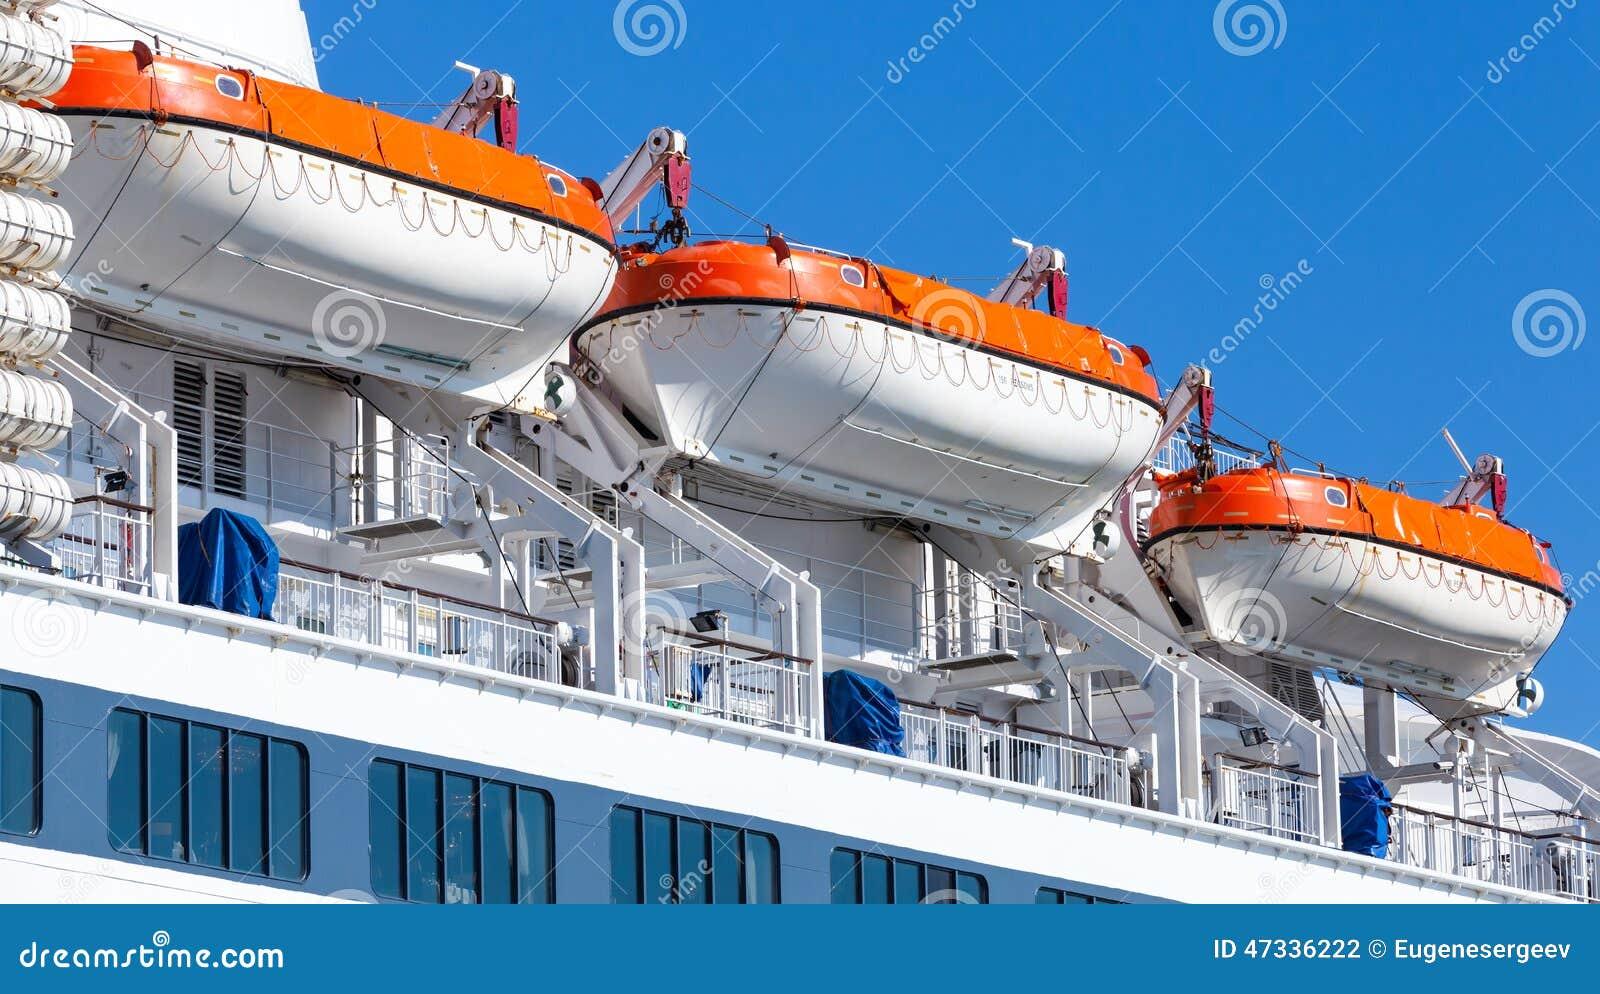 Rescue Boats On Big Passenger Ship Stock Photo Image